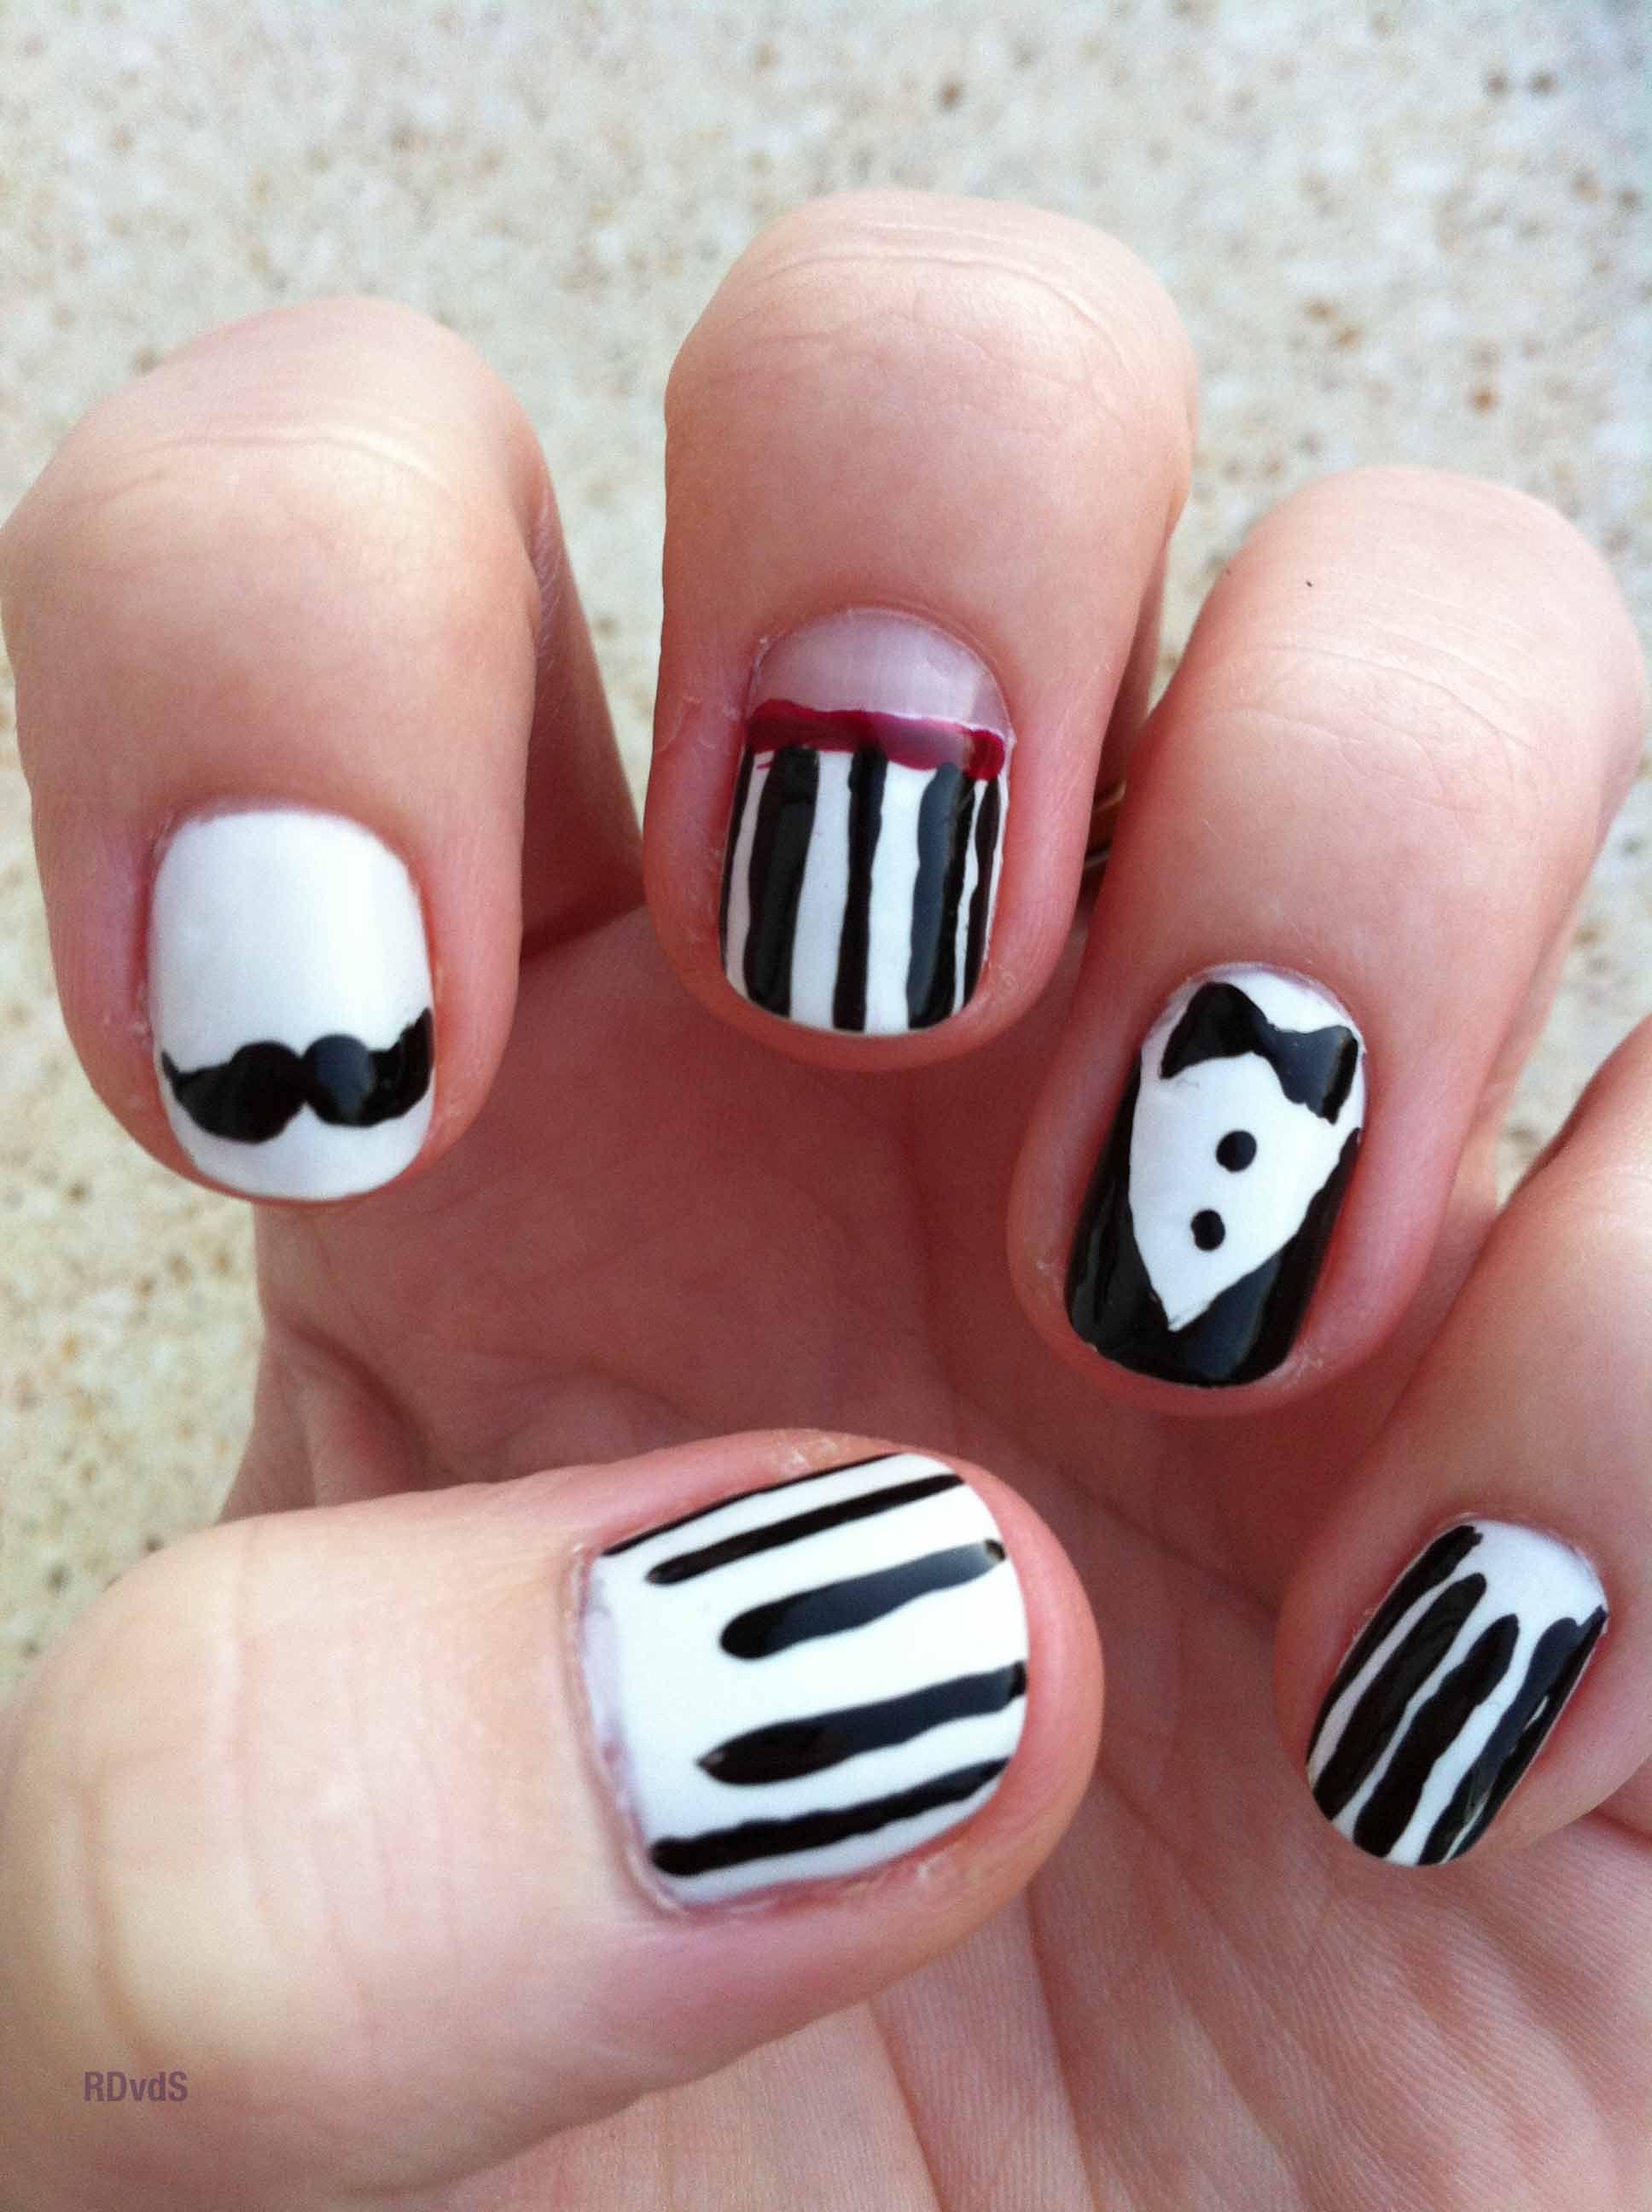 Tuxedo Mustage Mister Nail Art Rdvds Nails Pinterest